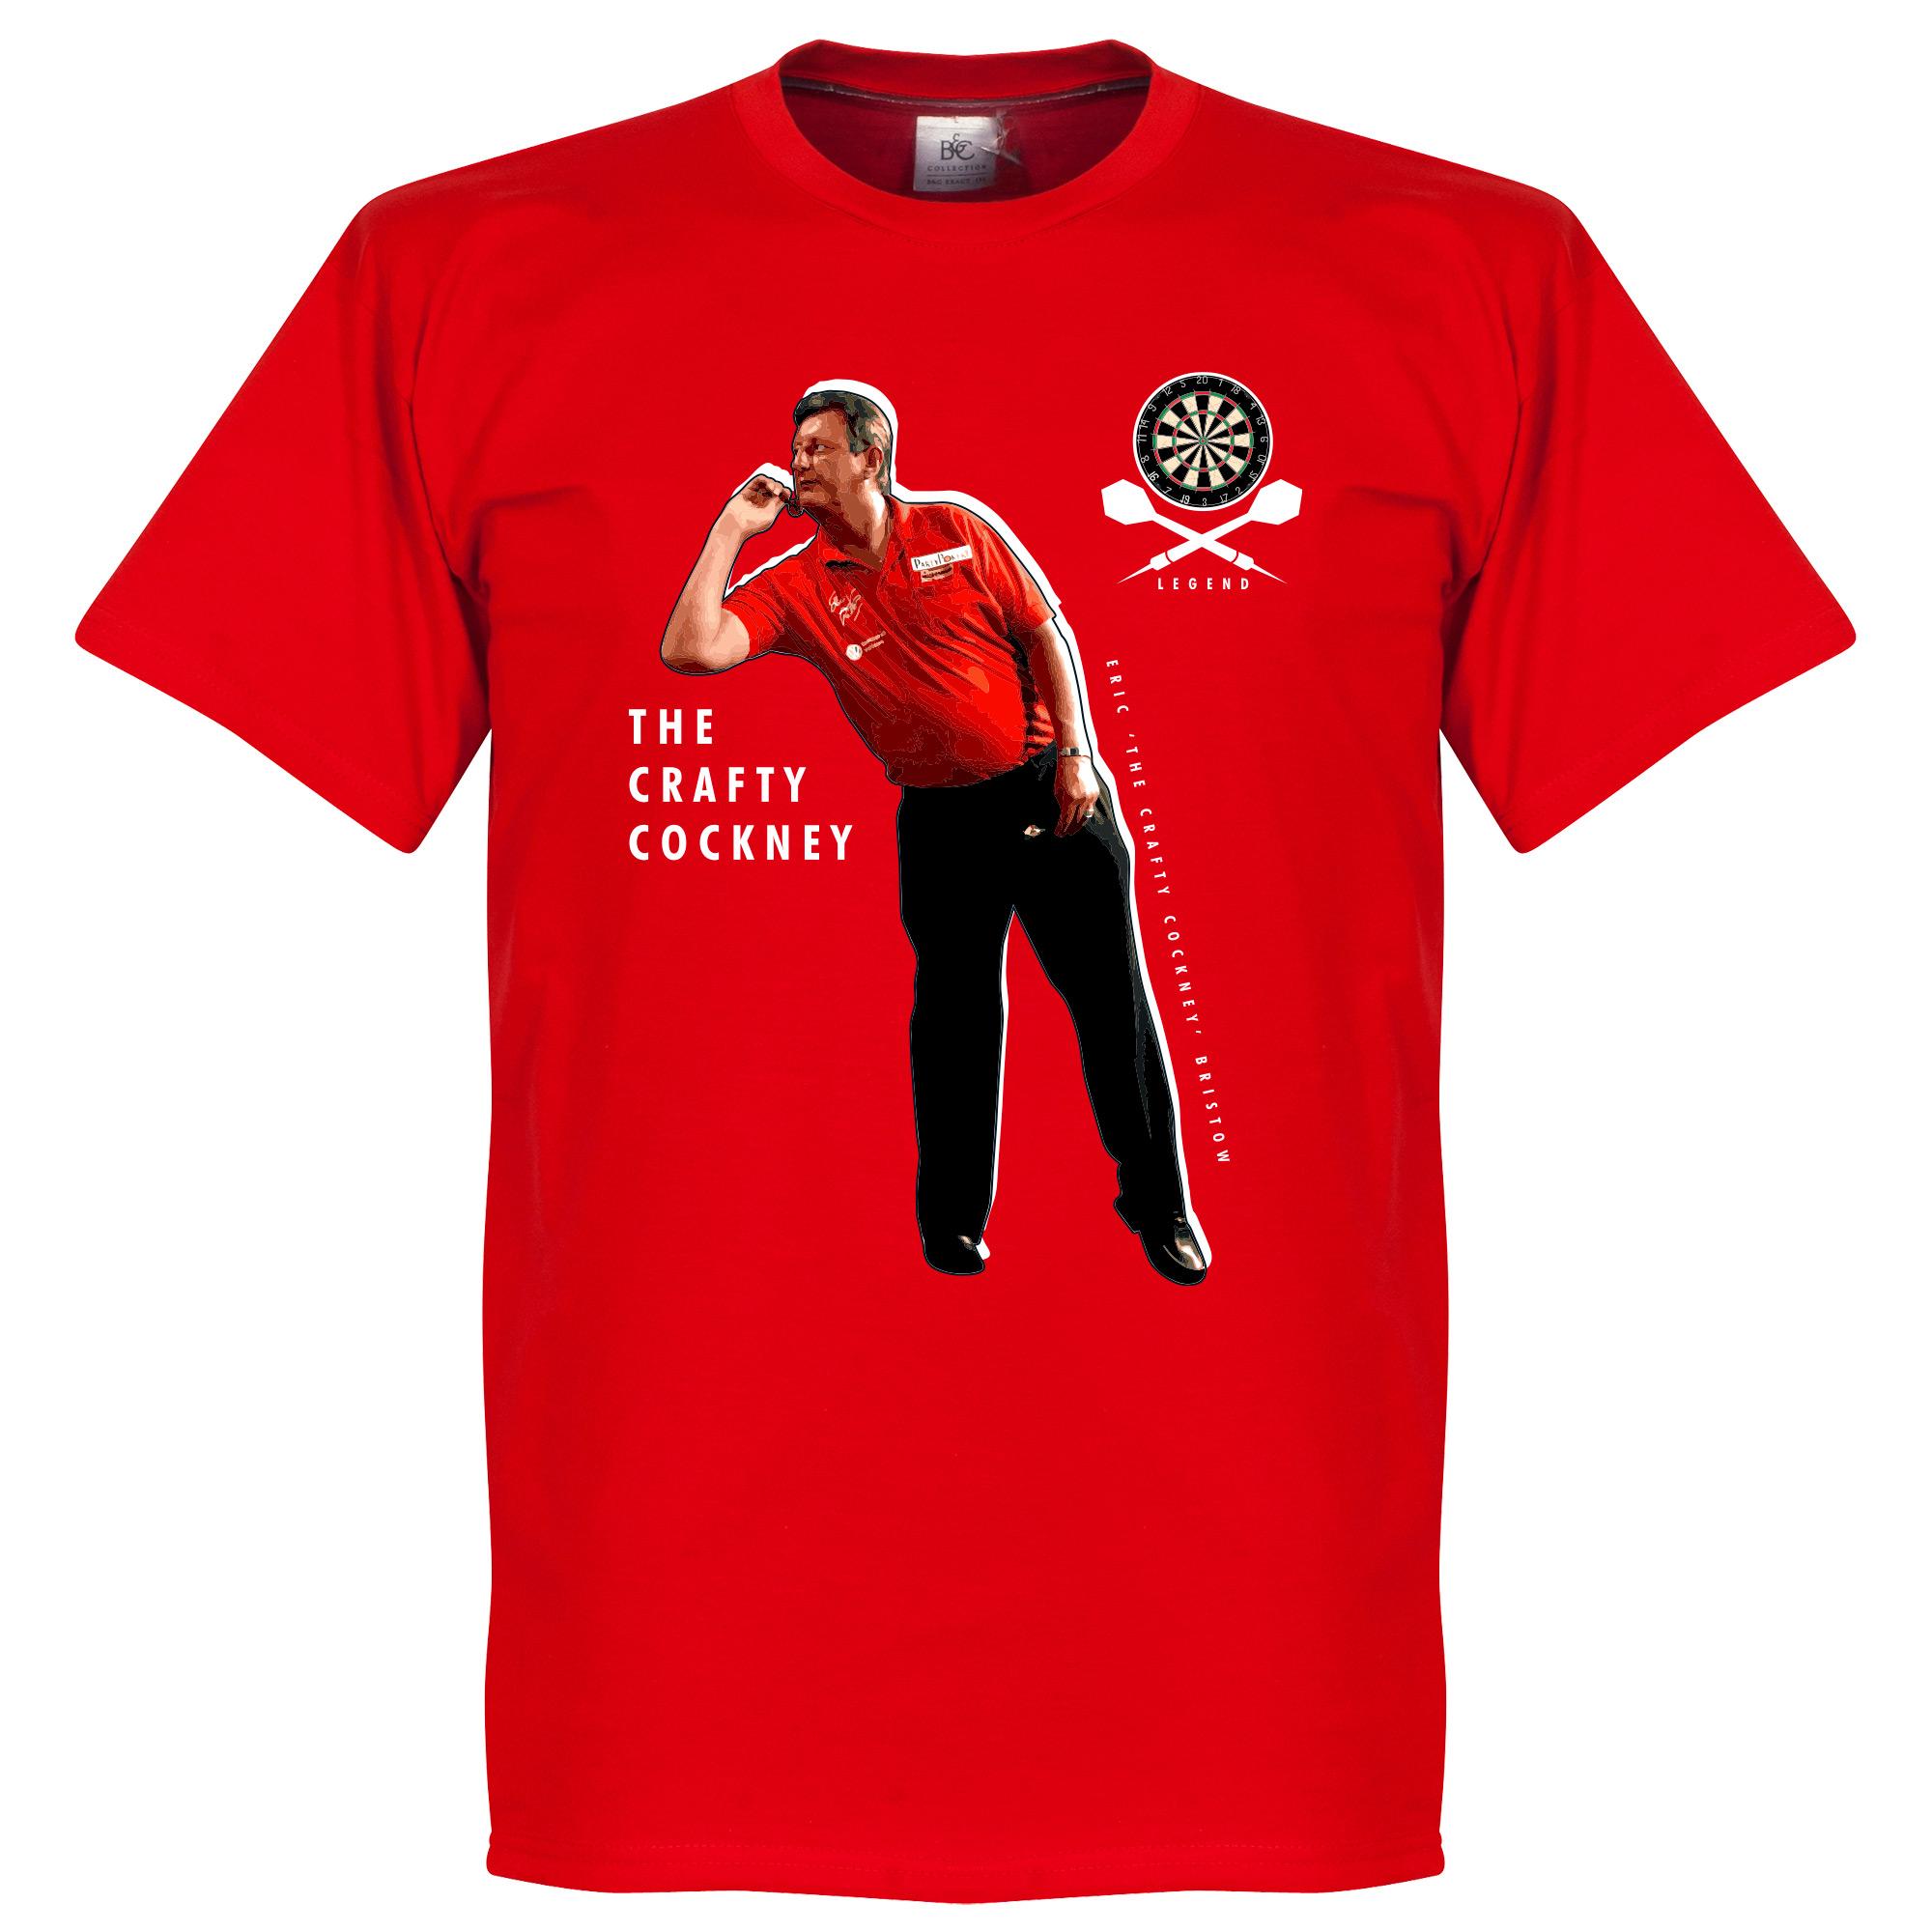 Eric Bristow Darts T-Shirt - L